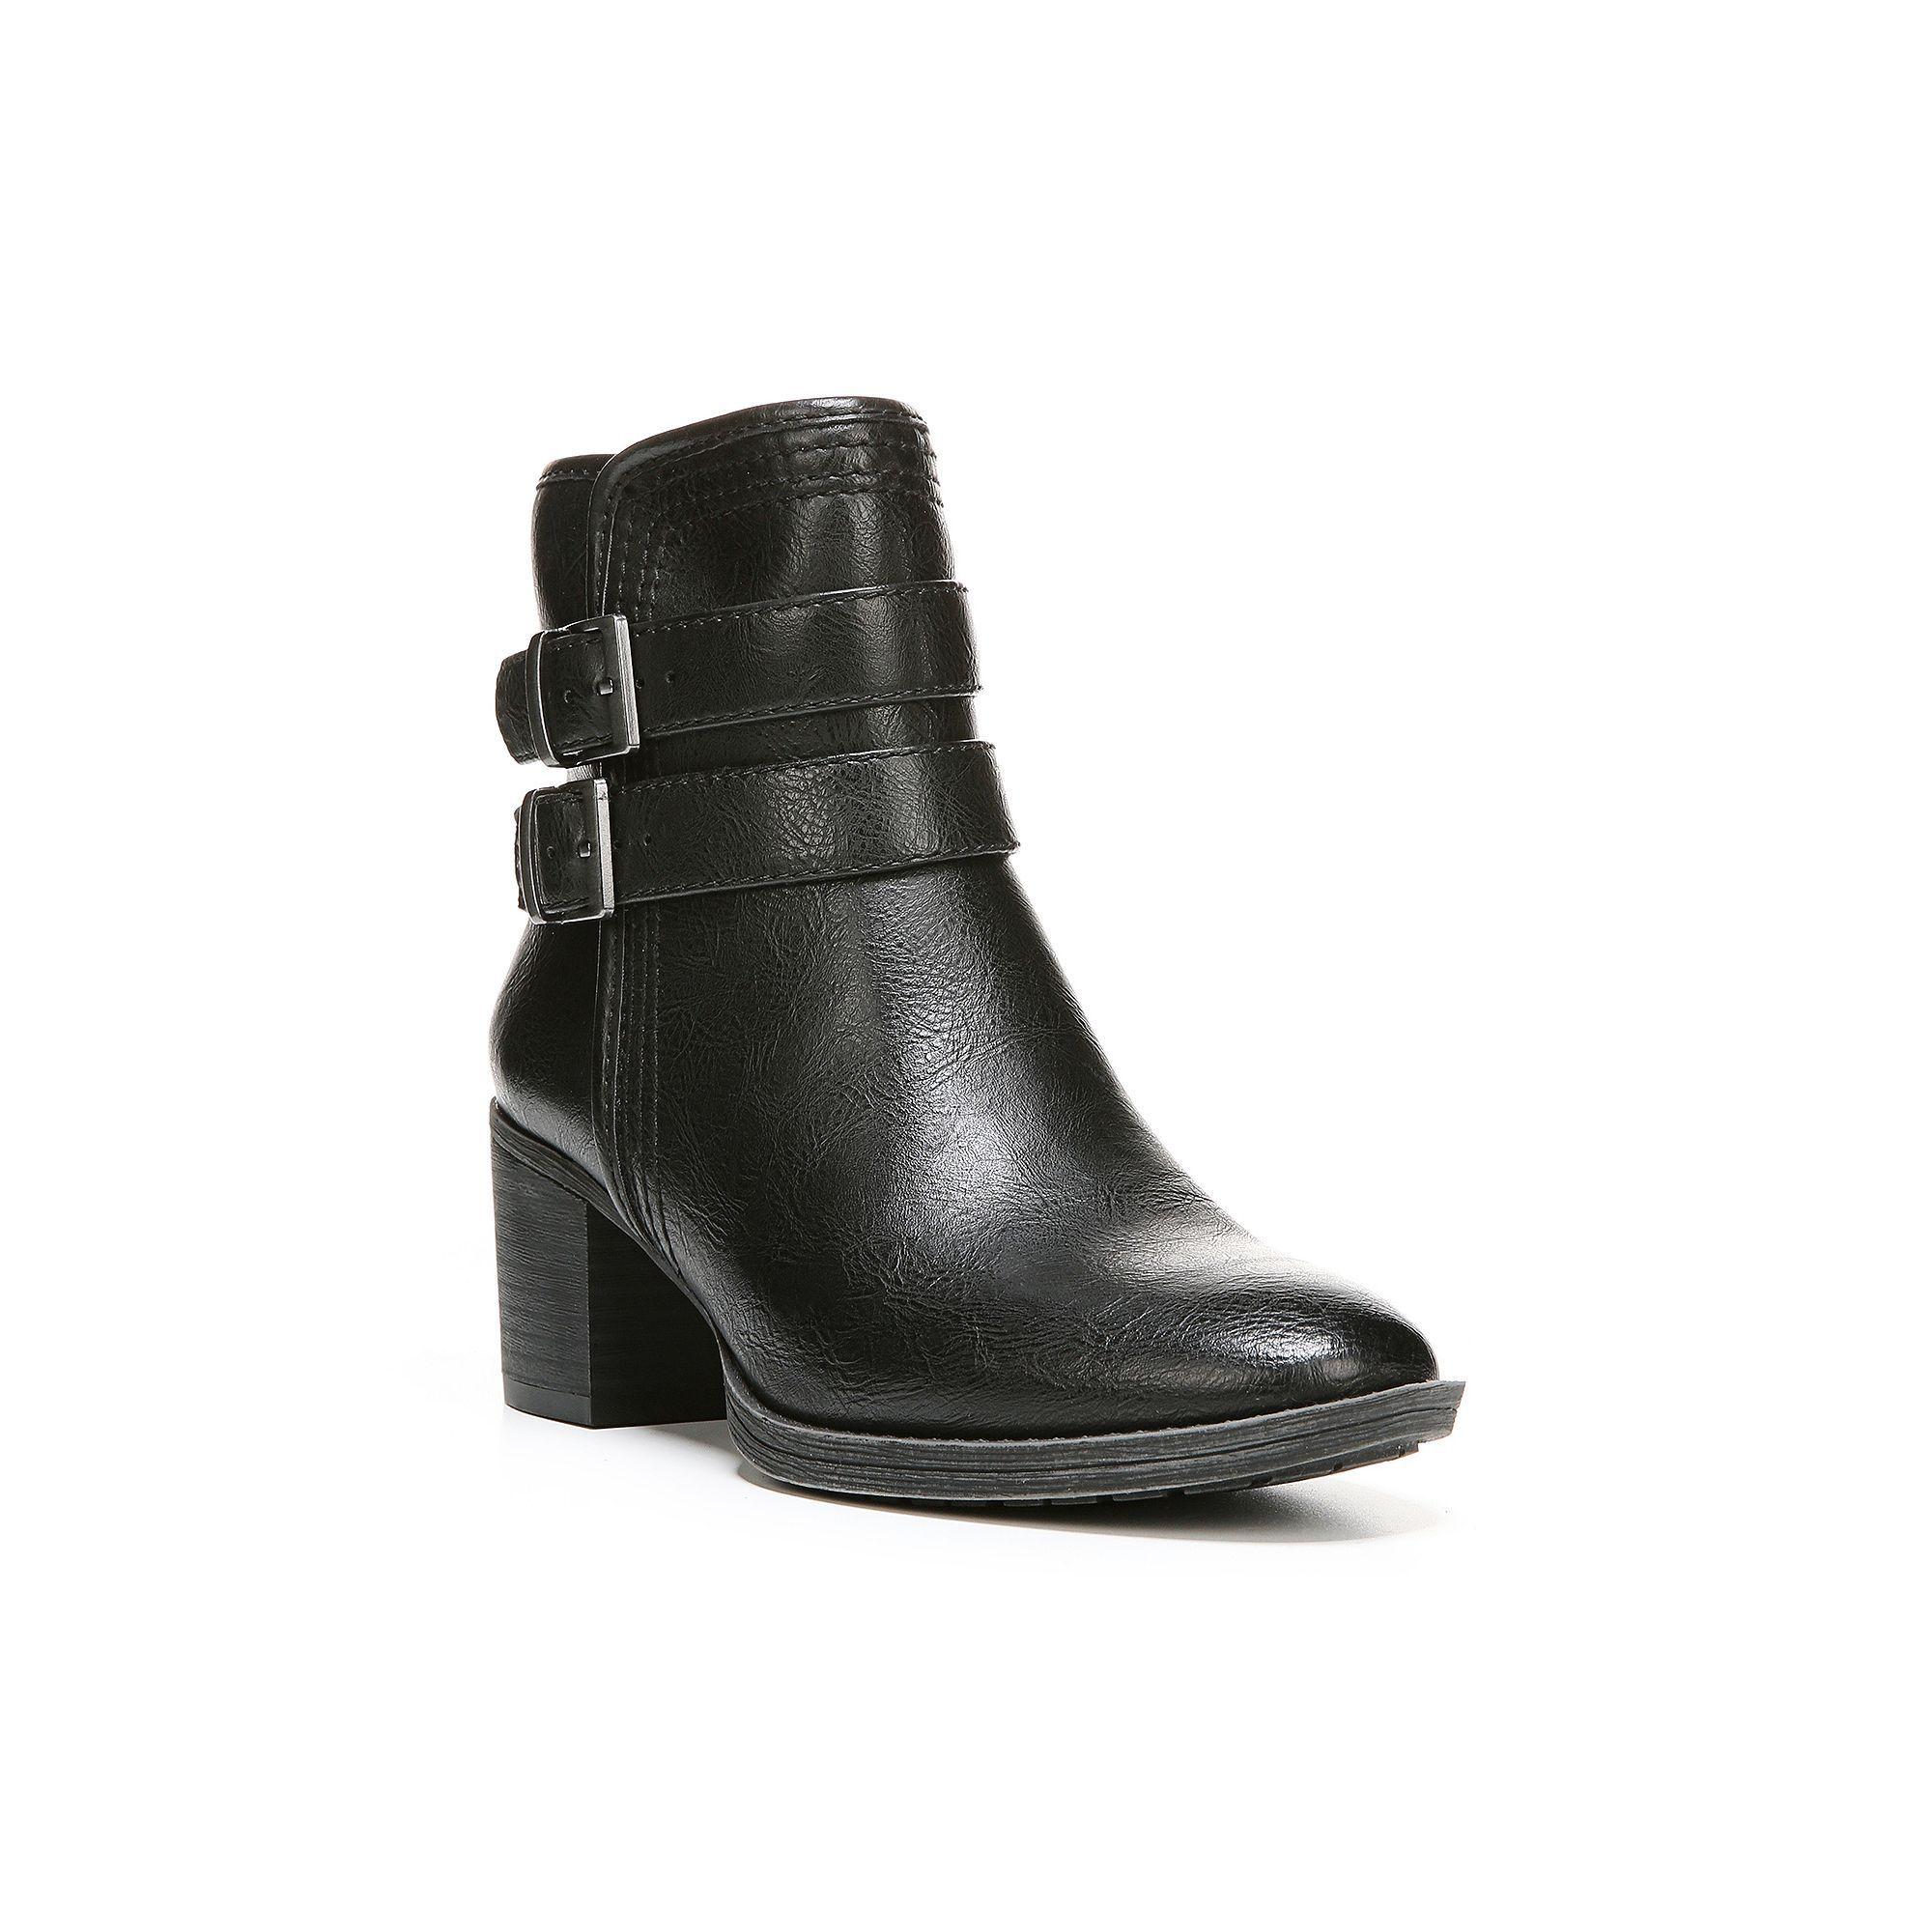 NaturalSoul by naturalizer Zarna Women's Ankle Boots, Size: medium (9.5),  Black